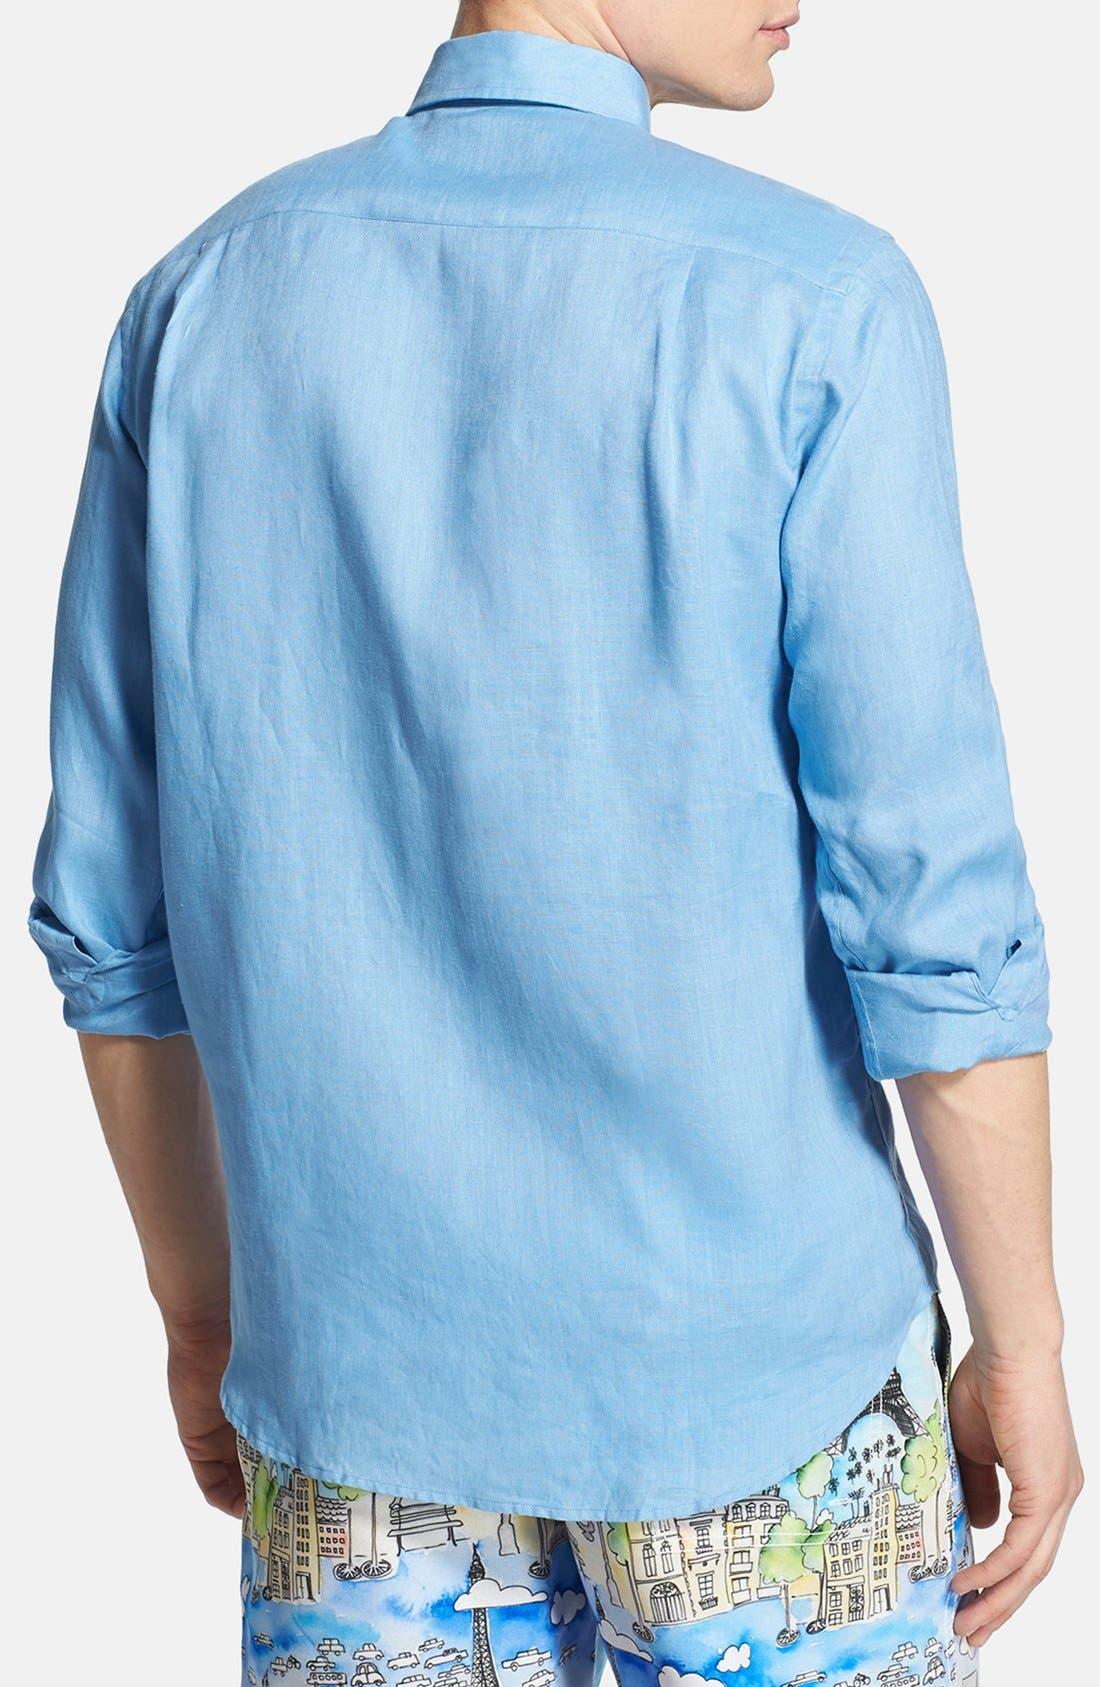 'Caroubier' Linen Shirt,                             Alternate thumbnail 26, color,